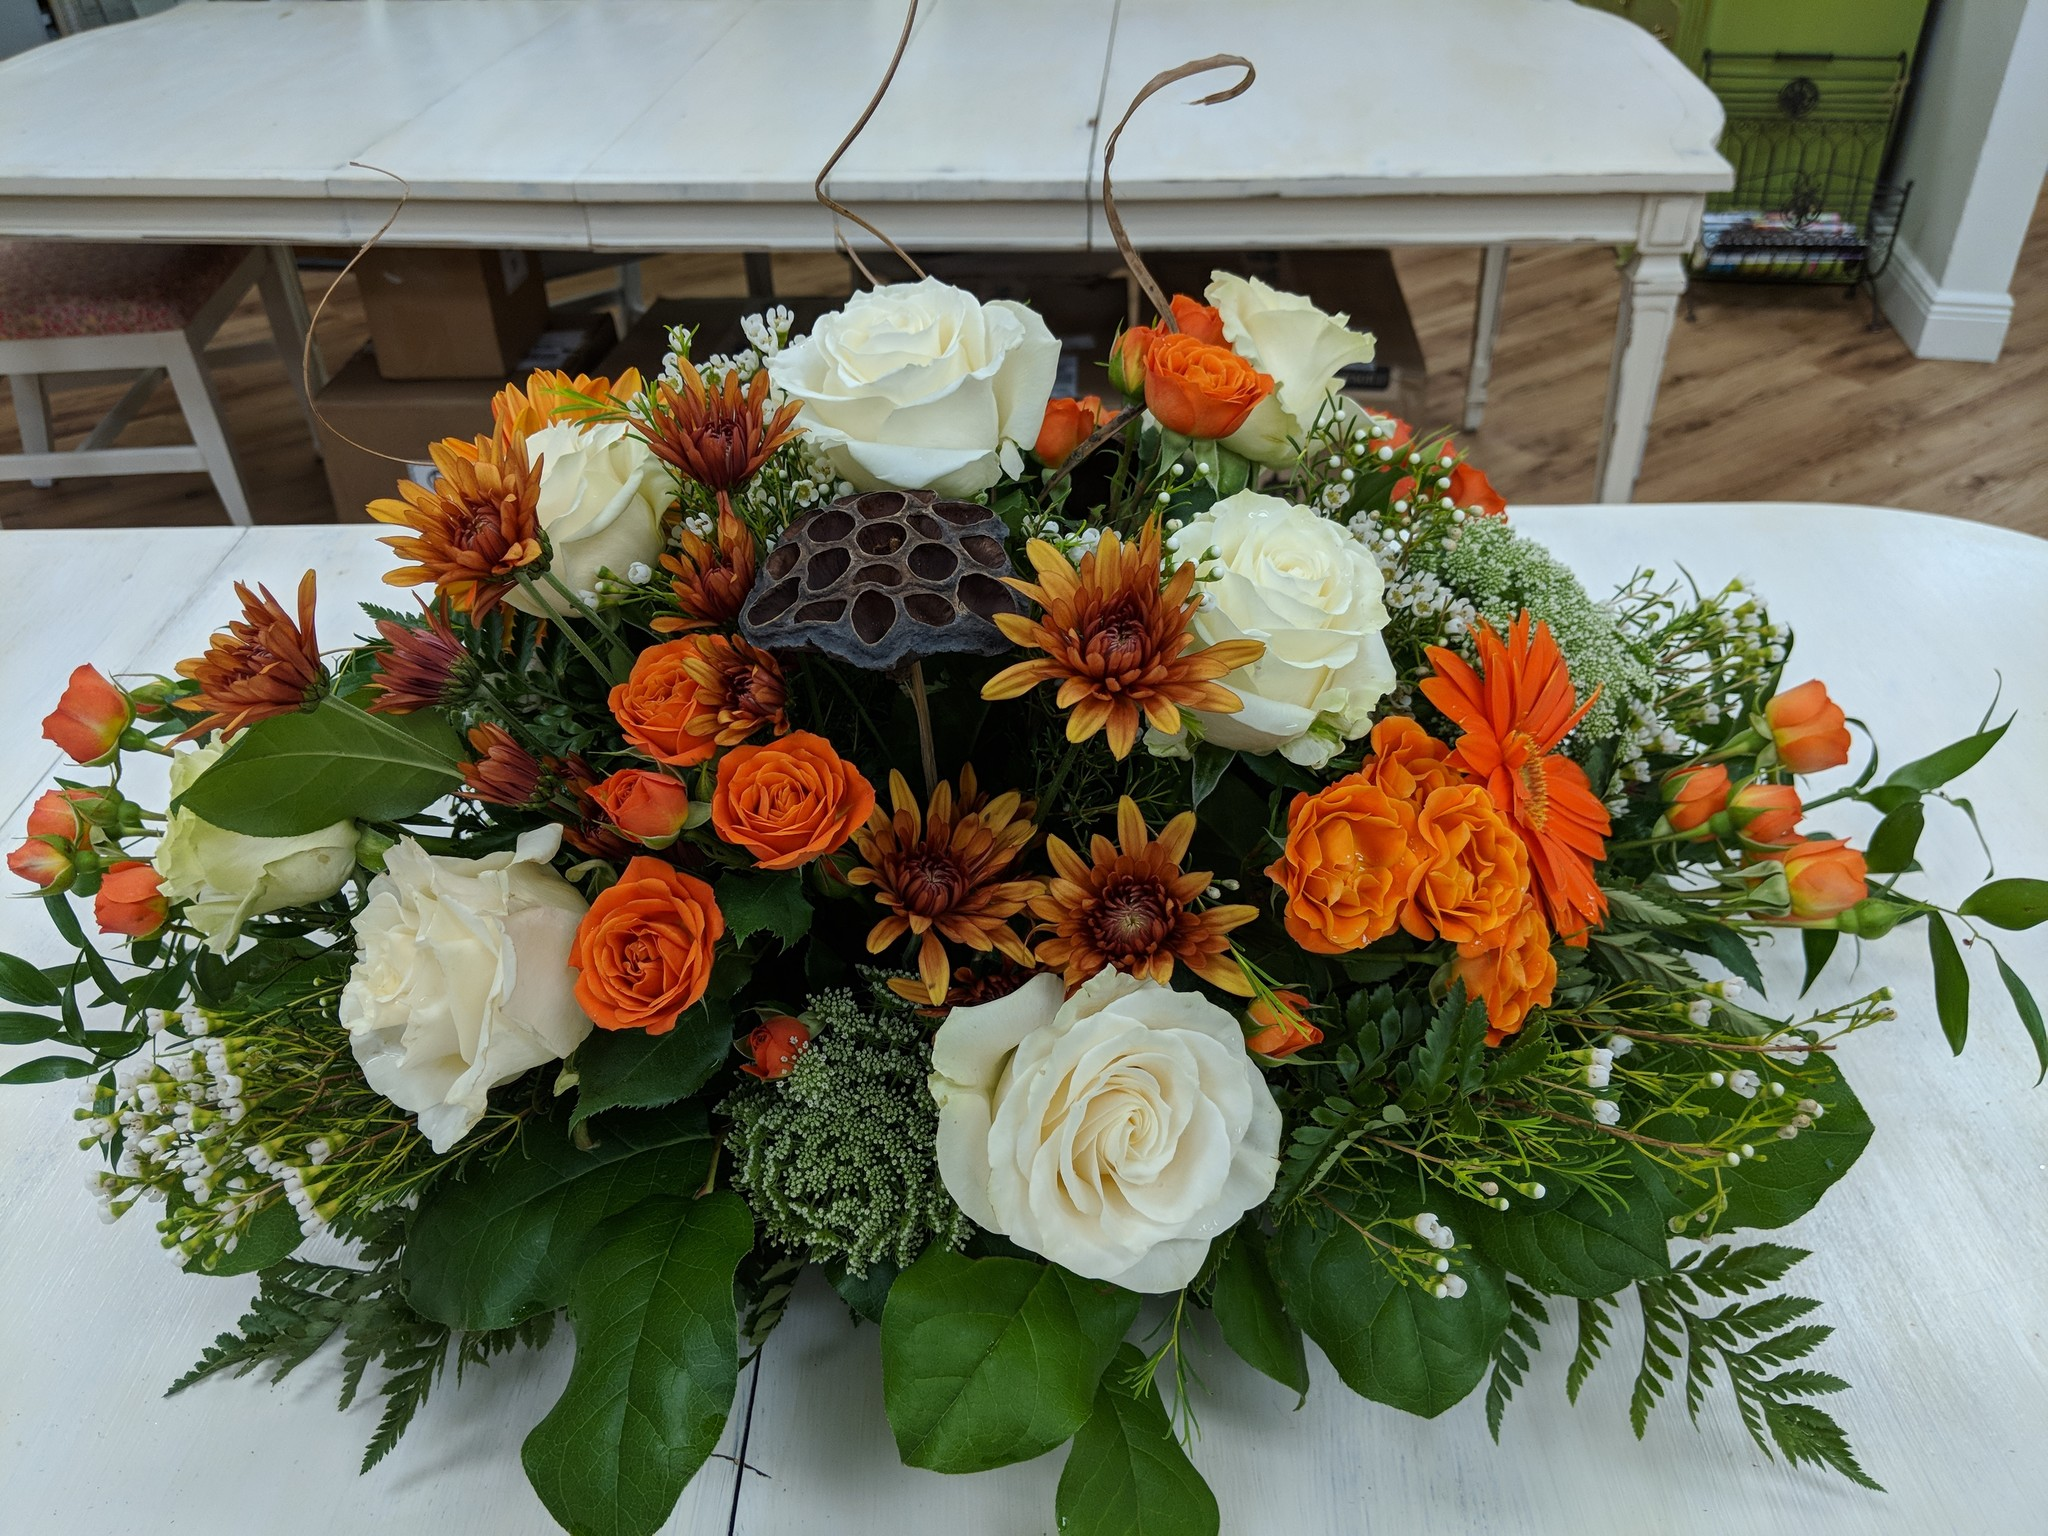 Floral Design: Thanksgiving Centerpiece, Tuesday November 26th 11:30am-1:30pm